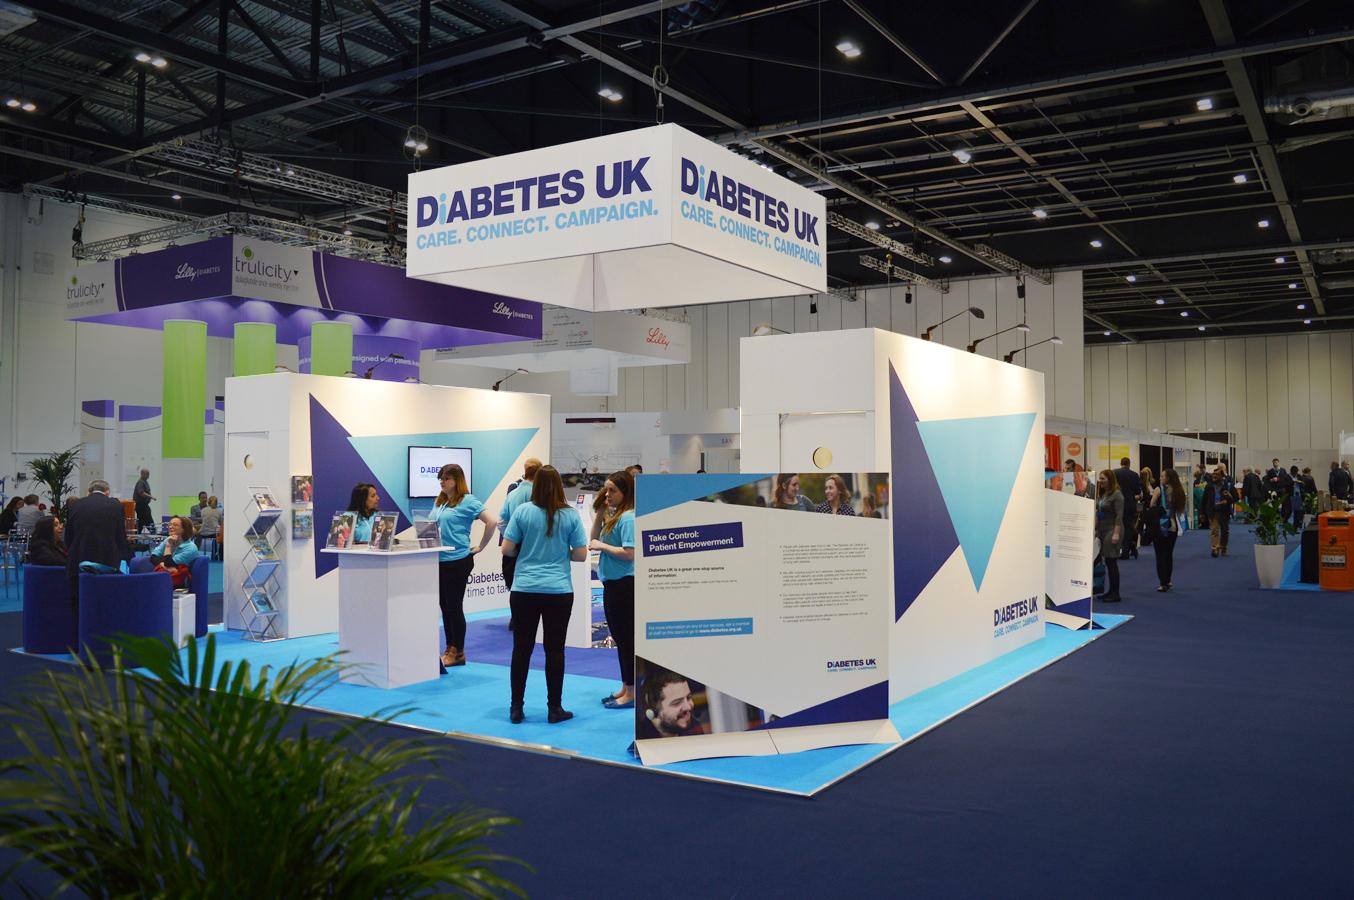 Exhibition Stand Contractors Uk : Stand portfolio exhibition services london modular